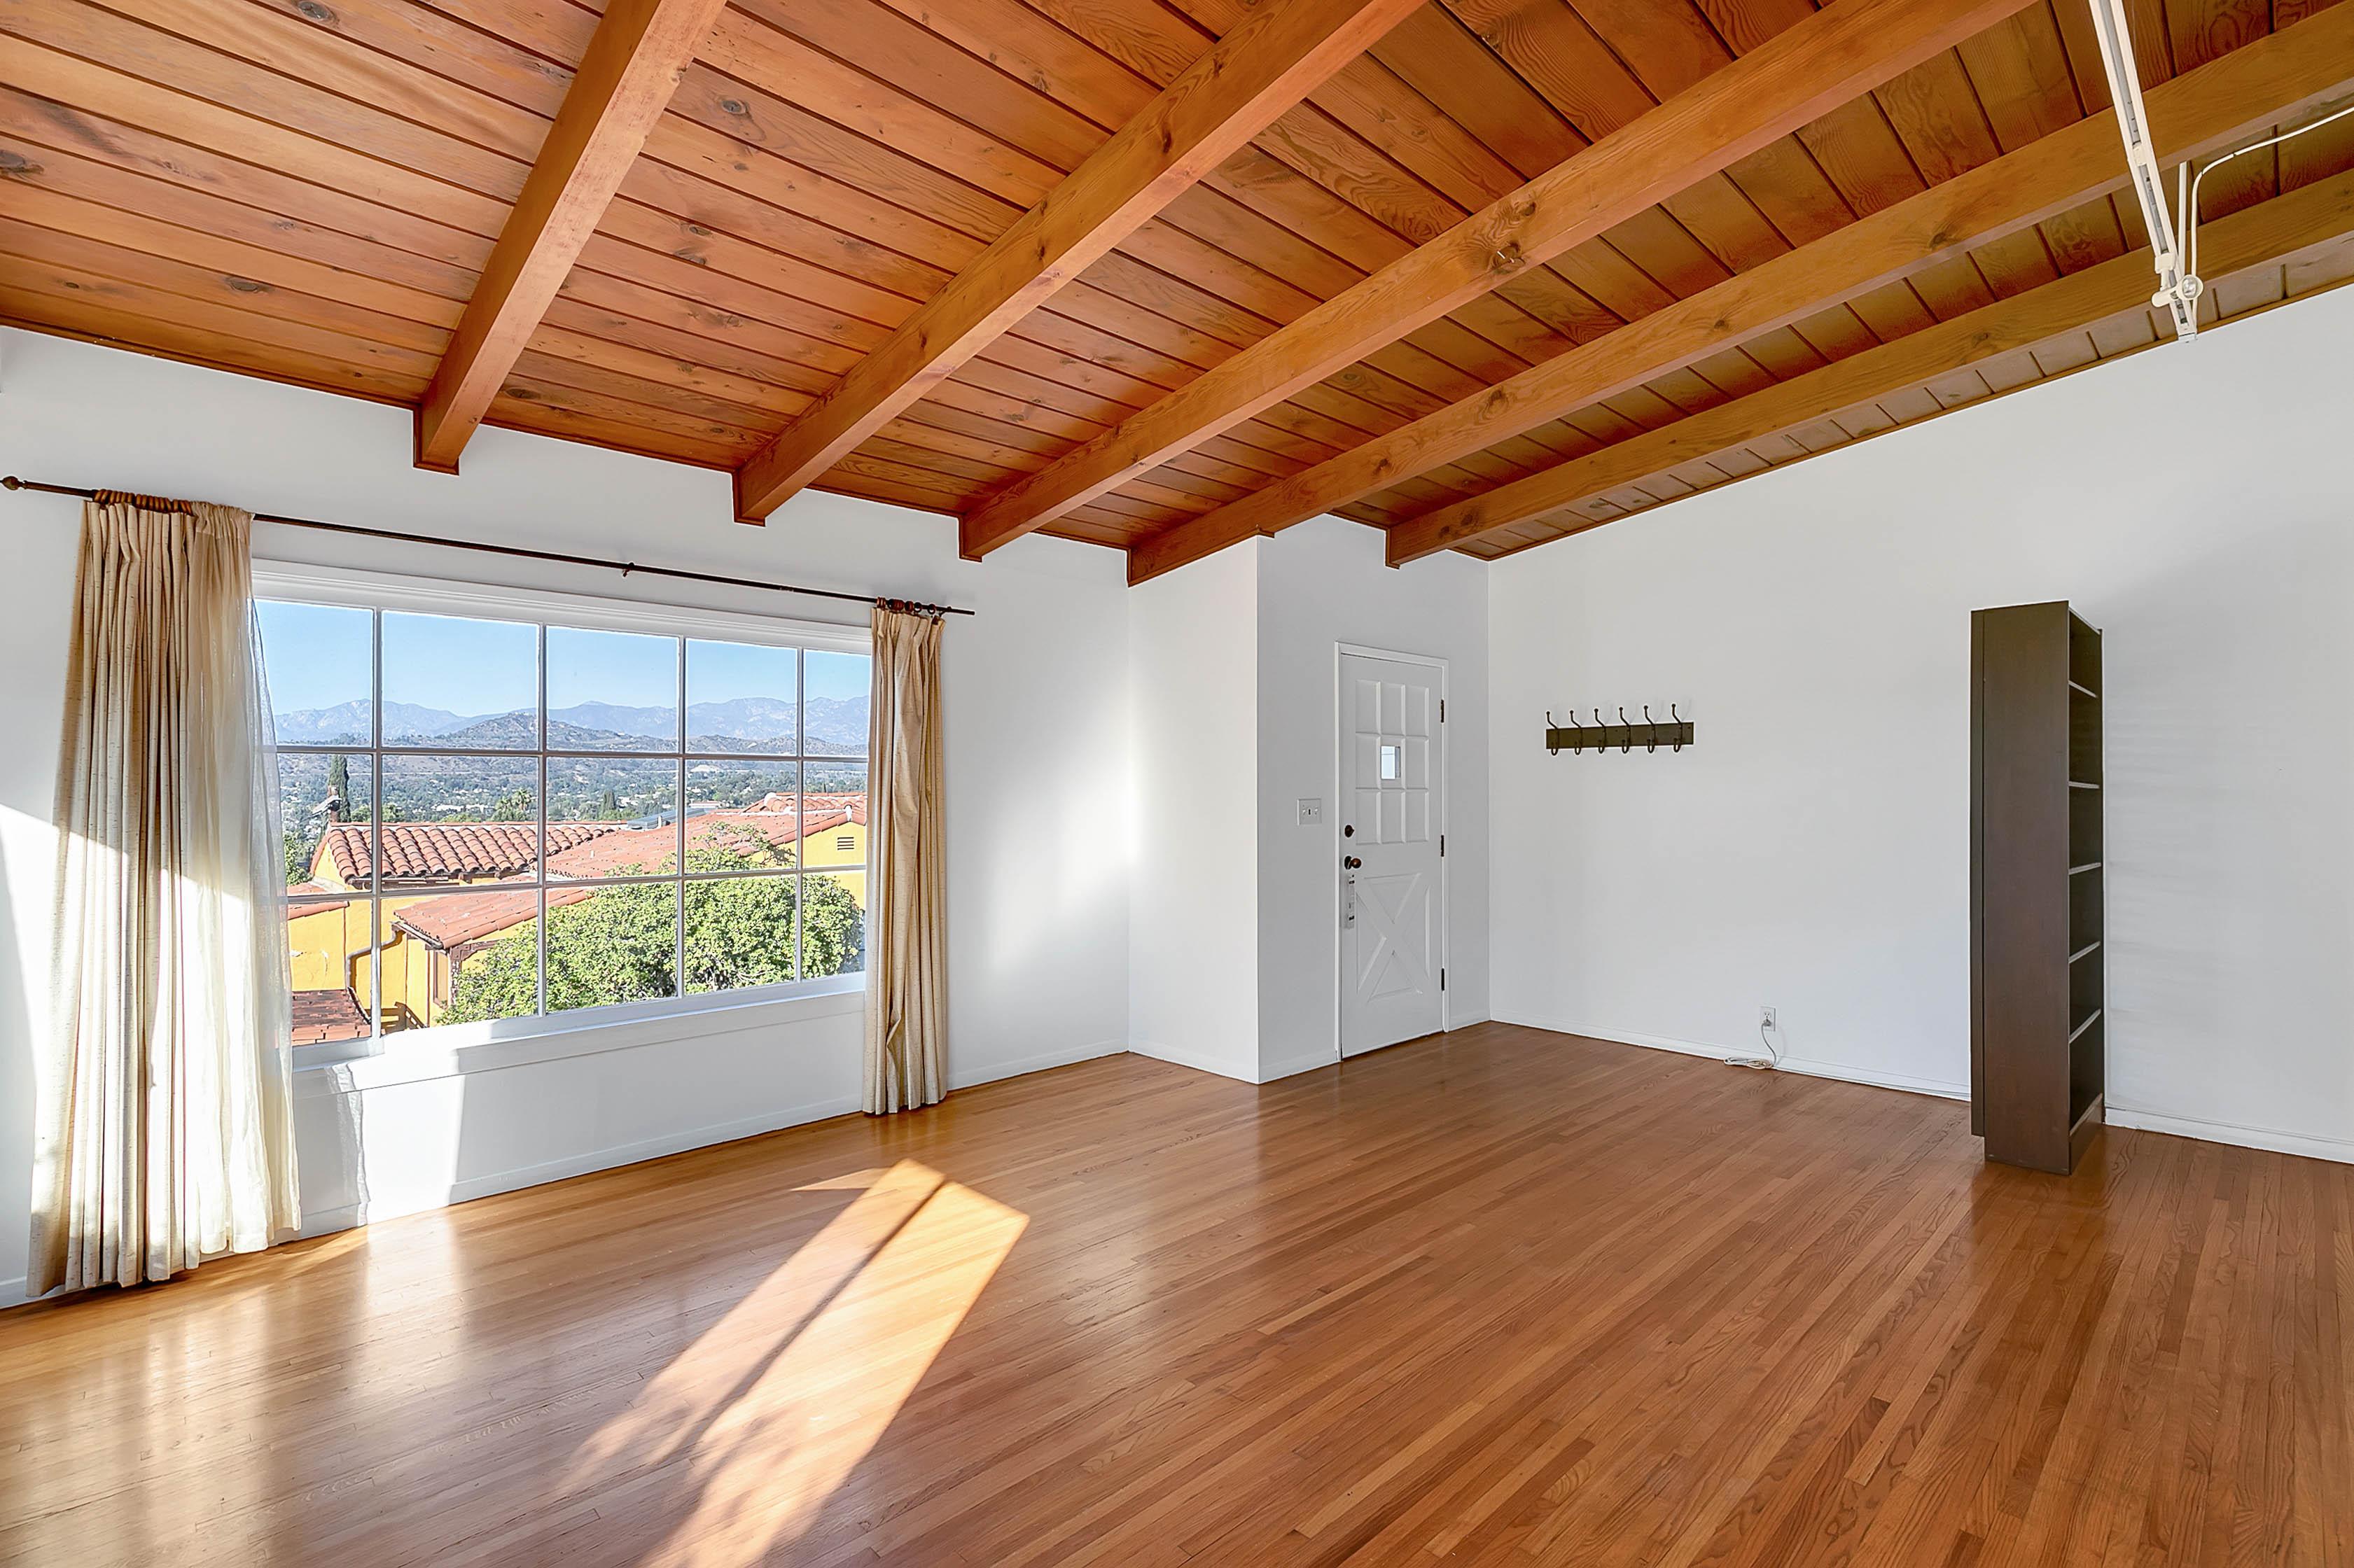 Hilltop Mt. Washington Home! | Bonus Den W/ Decorative Fireplace| Private Backyard | Driveway & Garage Parking Available!